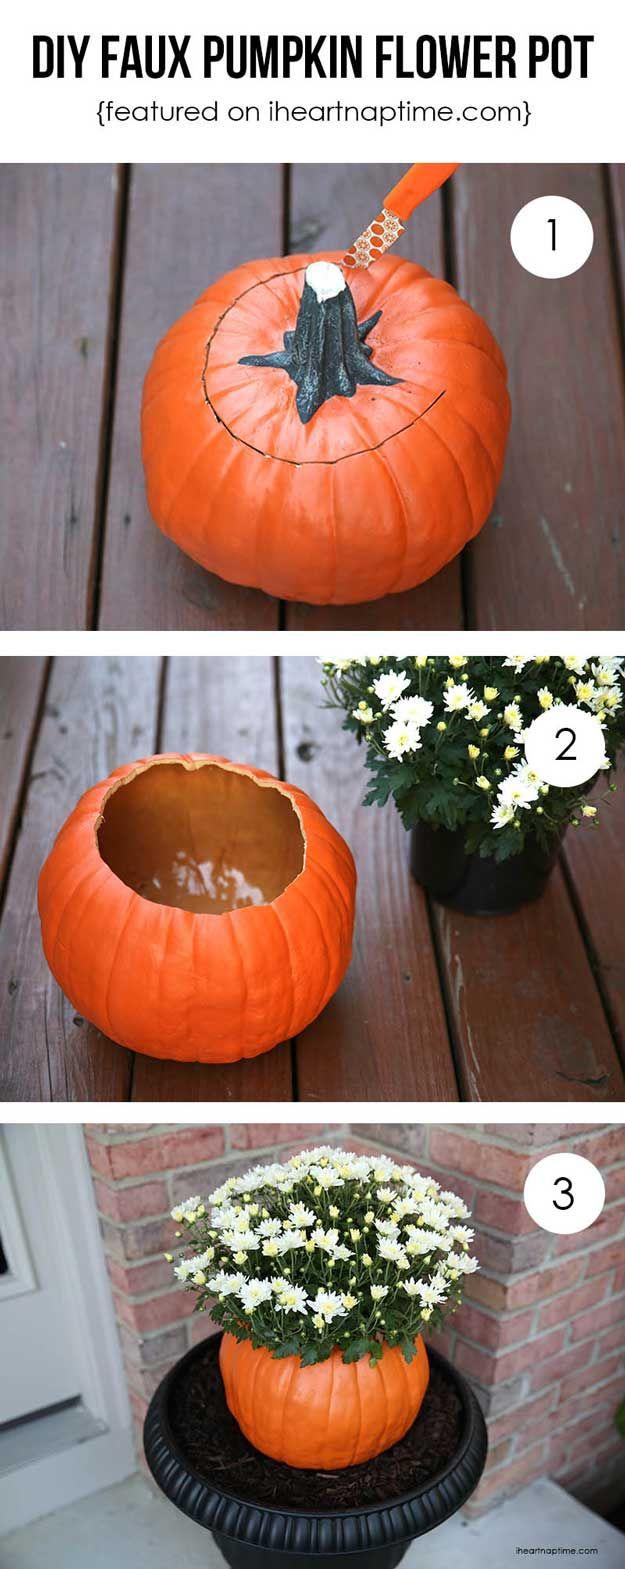 Best 25+ Faux pumpkins ideas on Pinterest | Pumpkin table ...